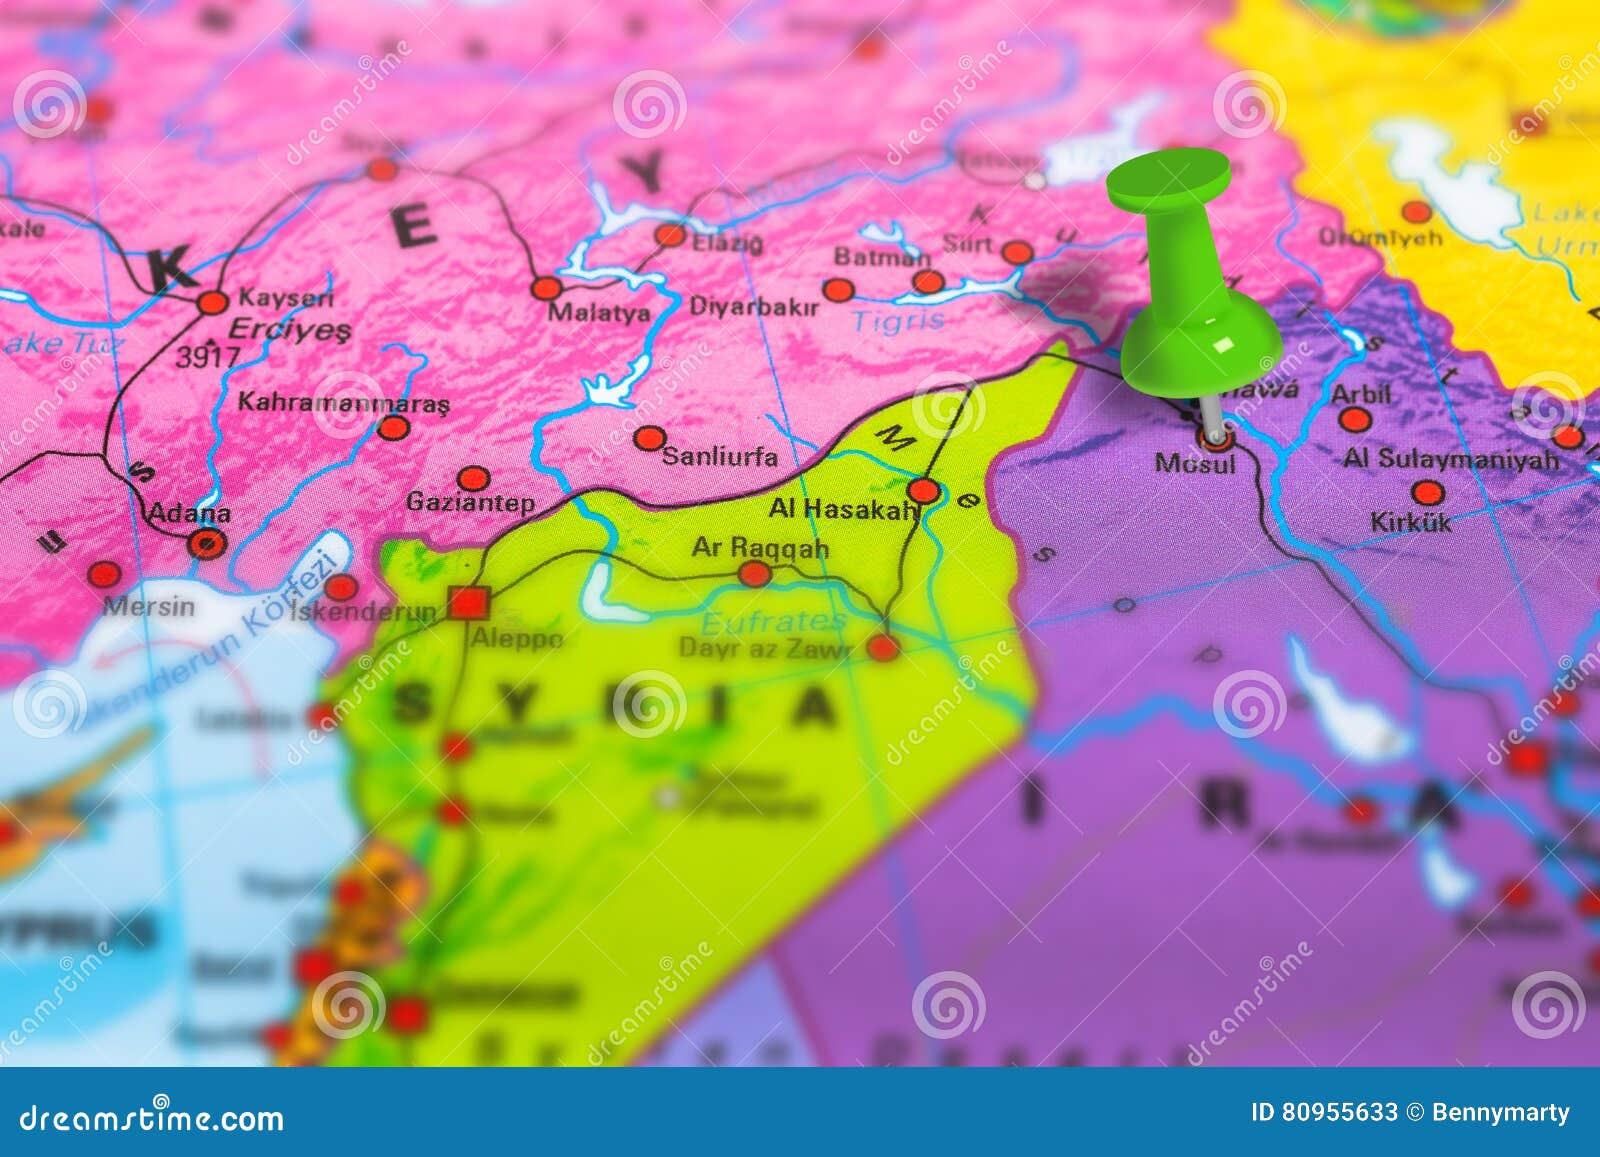 Mosul Iraq map stock image  Image of macro, culture